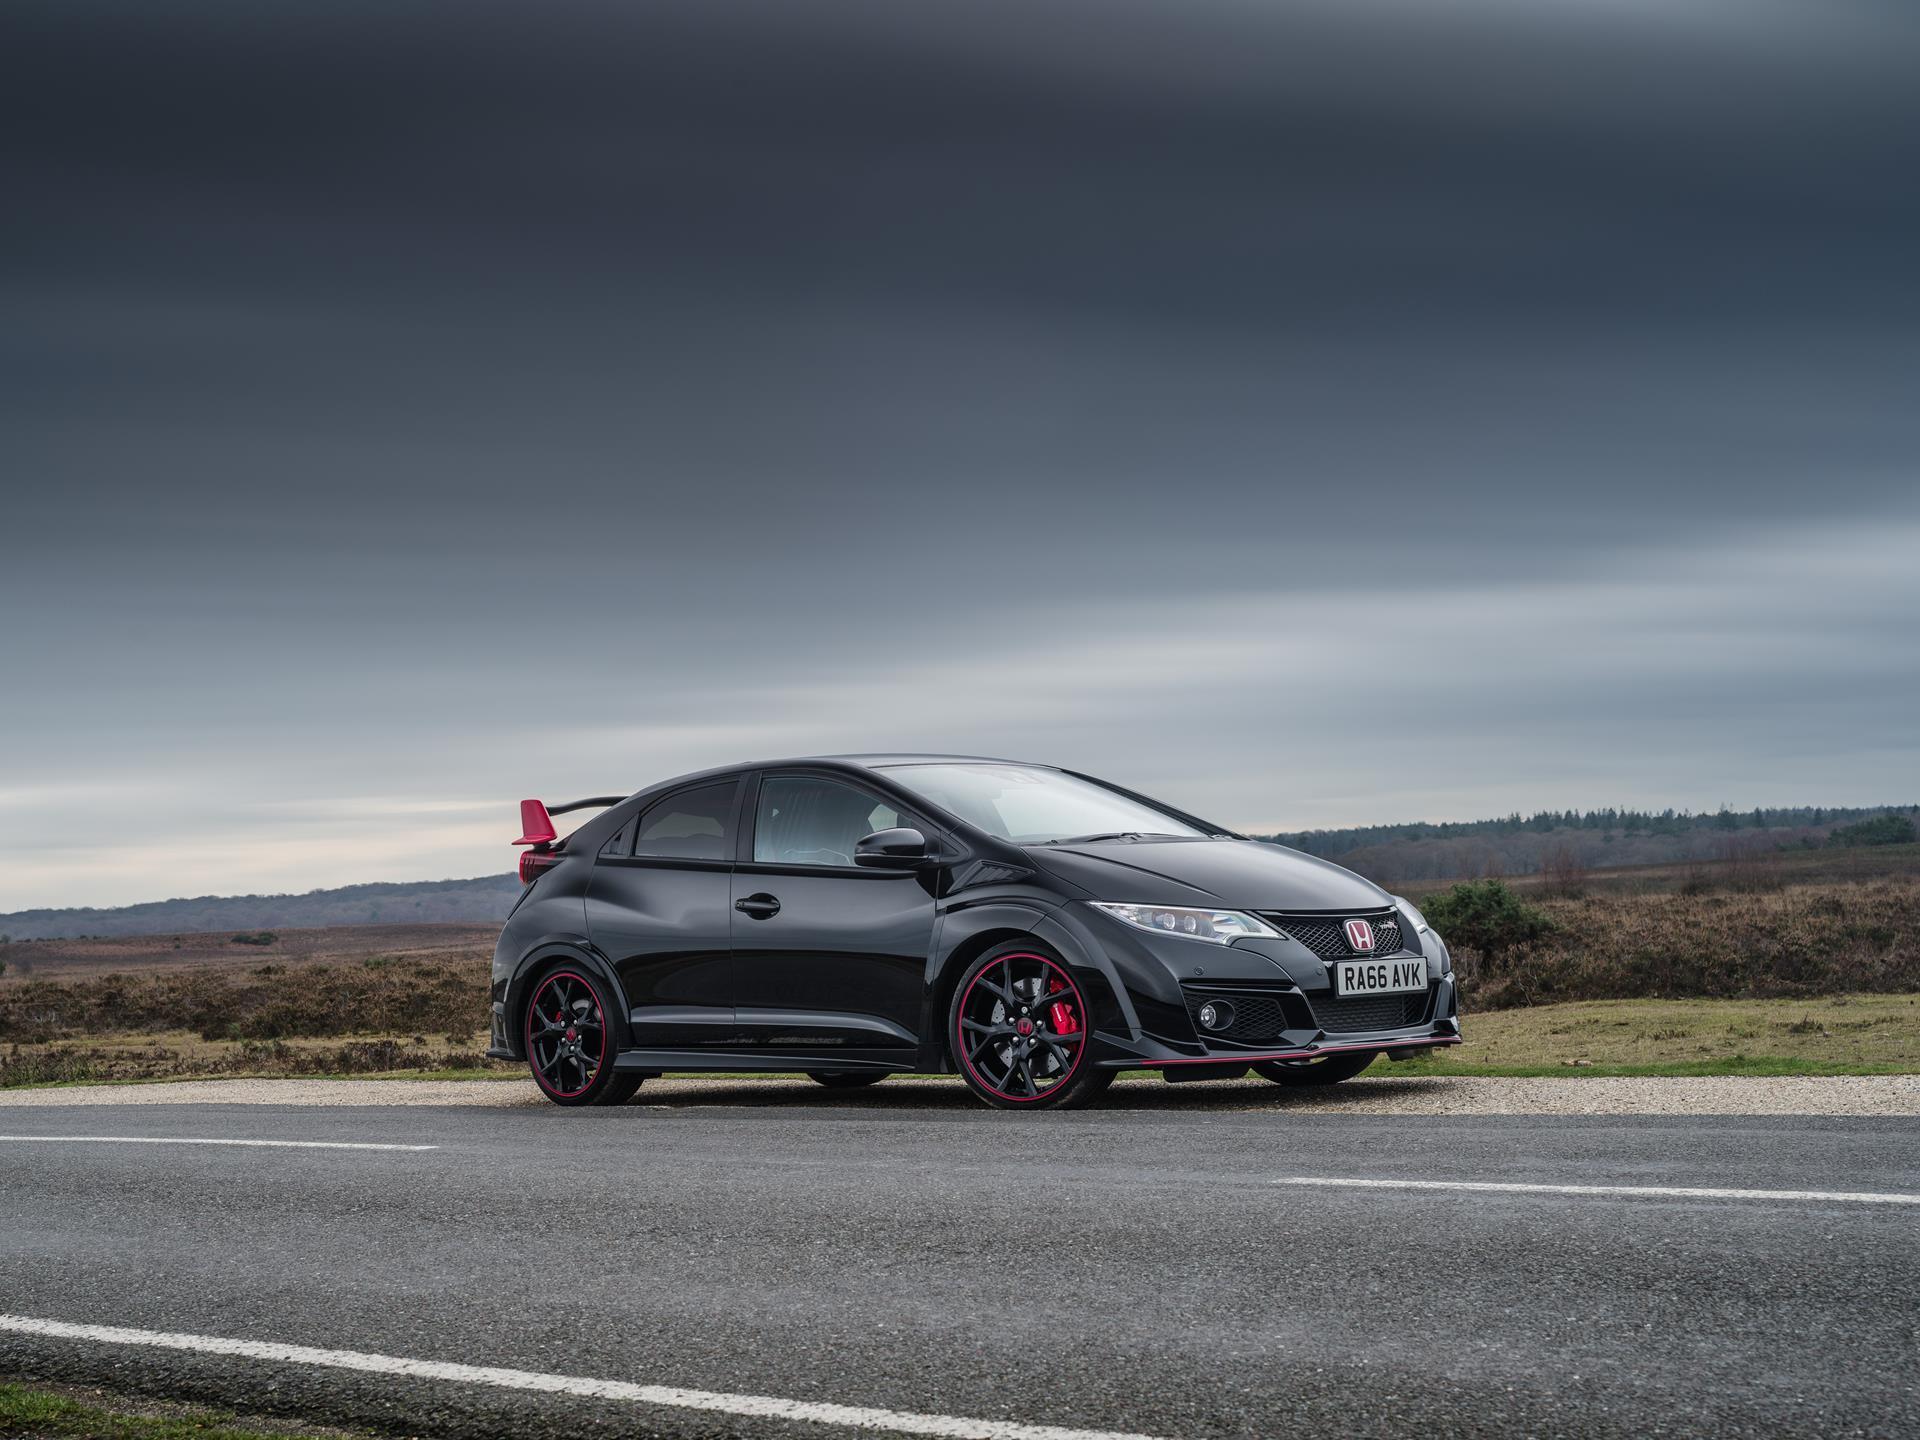 2017 Honda Civic Type R Black Edition News And Information